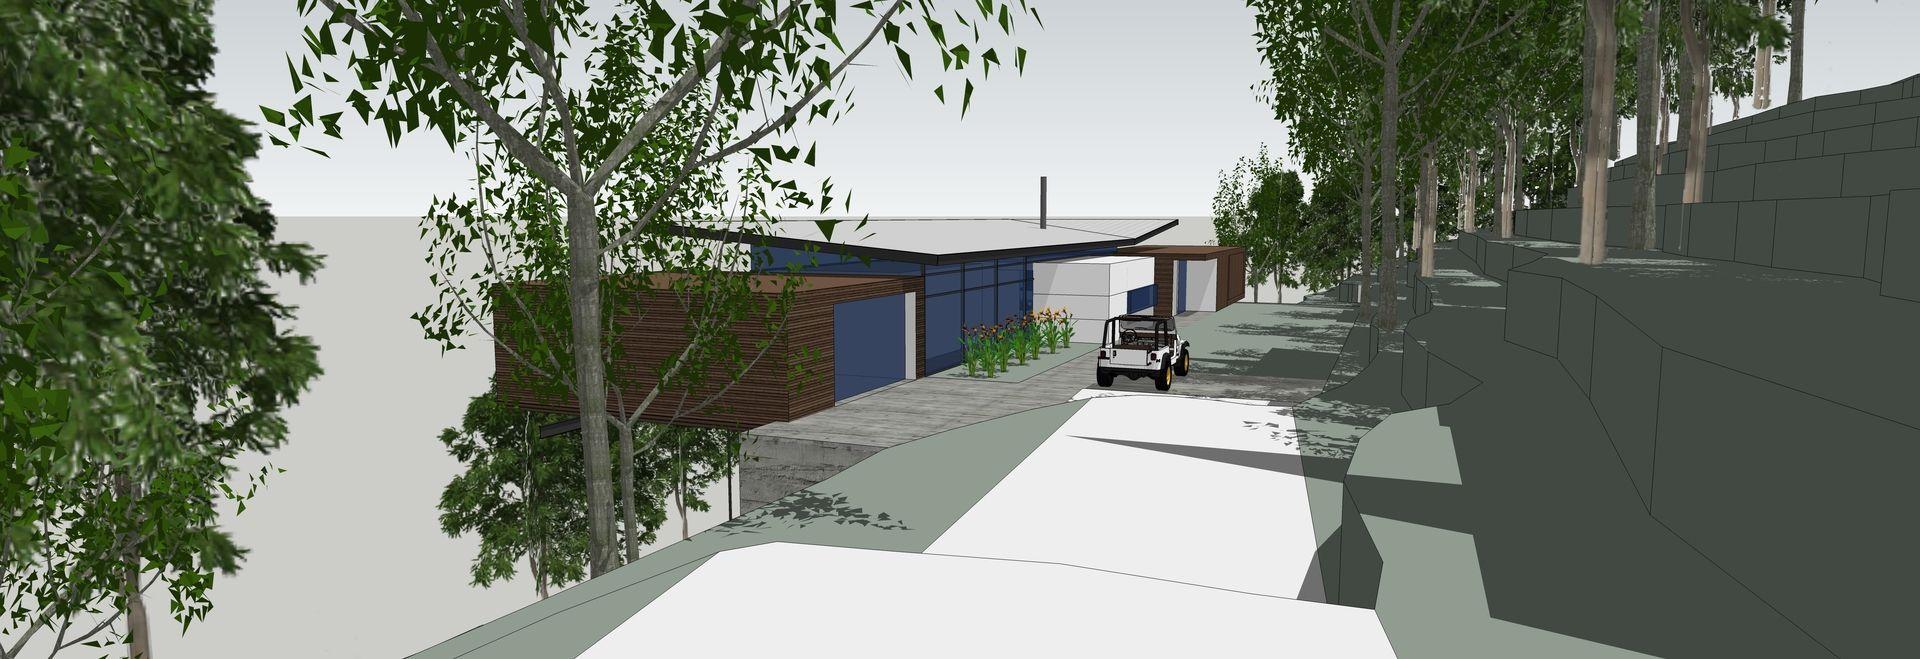 187 Tallgum Avenue, Doonan QLD 4562, Image 1